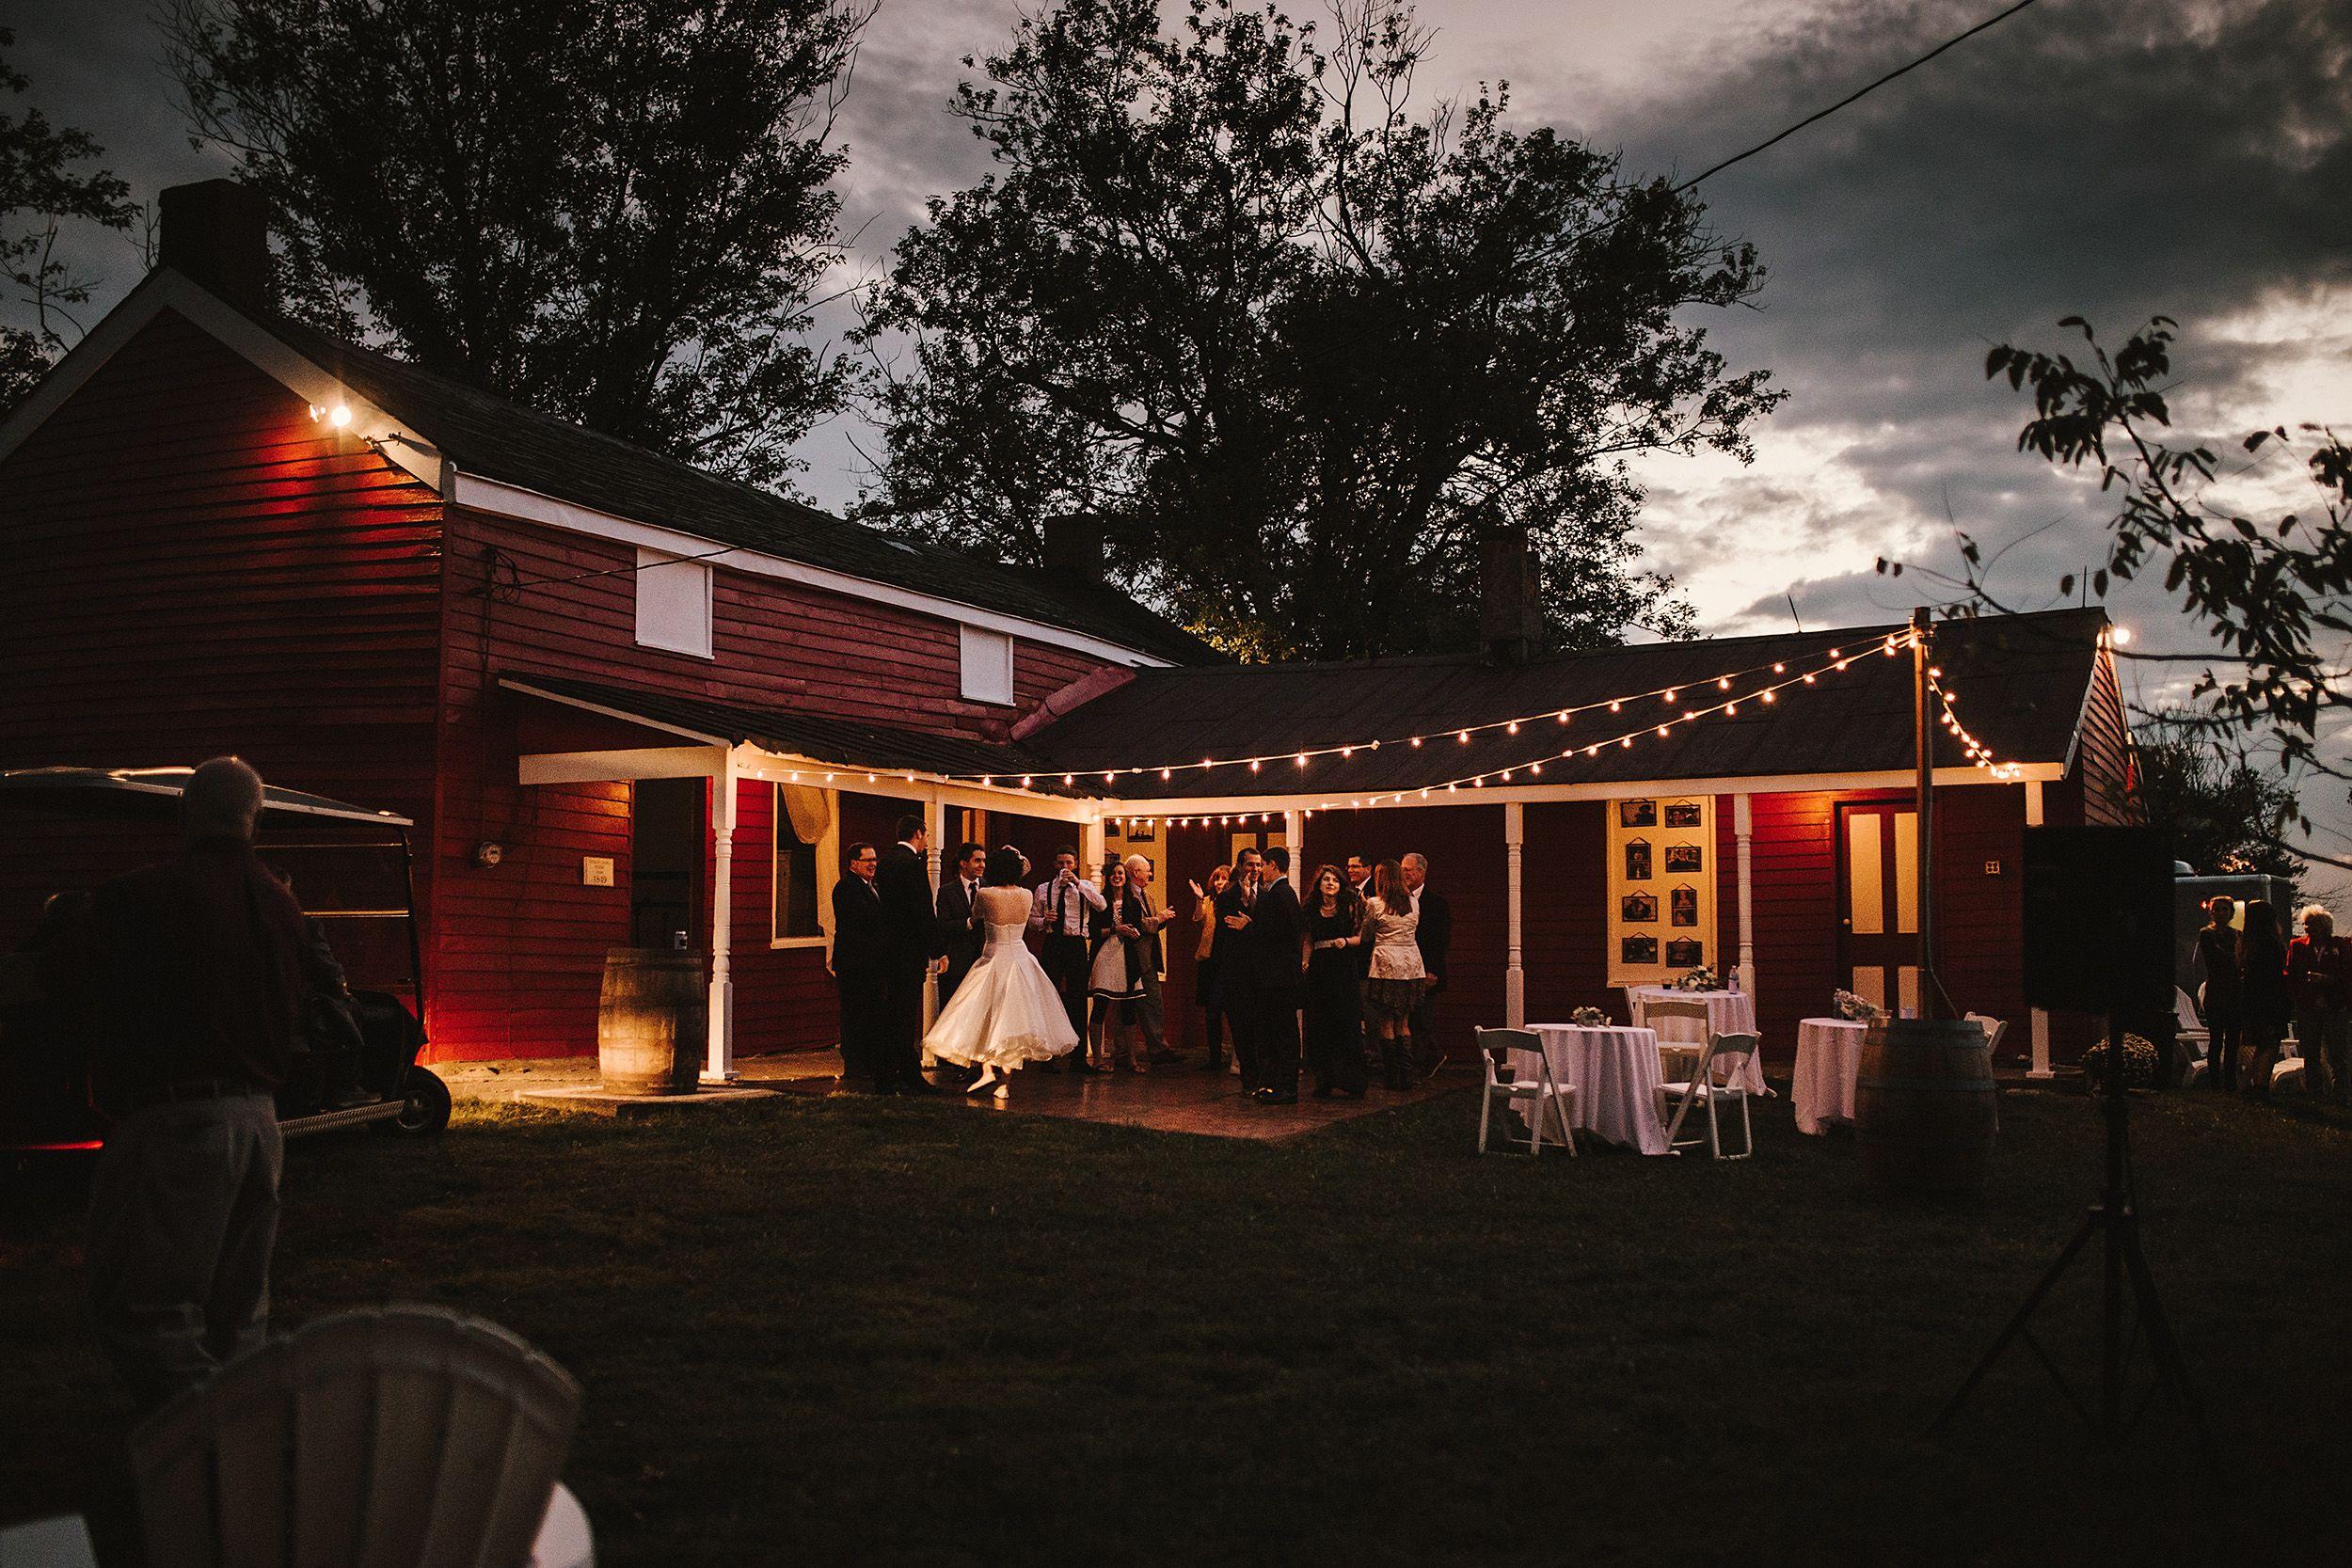 Intimate Wedding Reception Weddingreception Intimatewedding